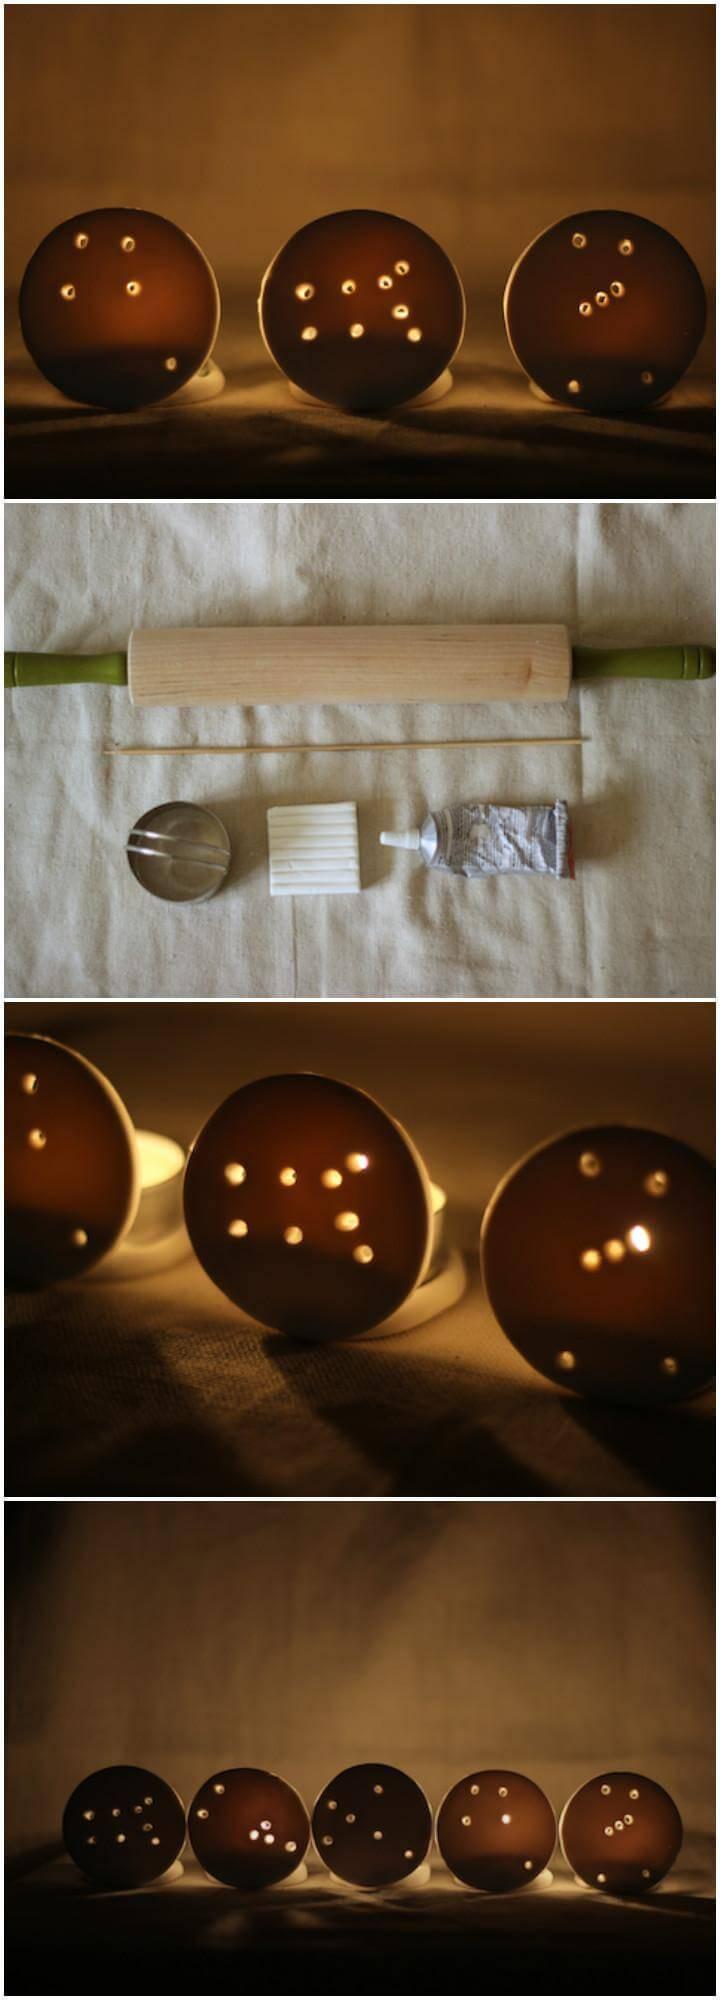 self-made constellation white clay votives